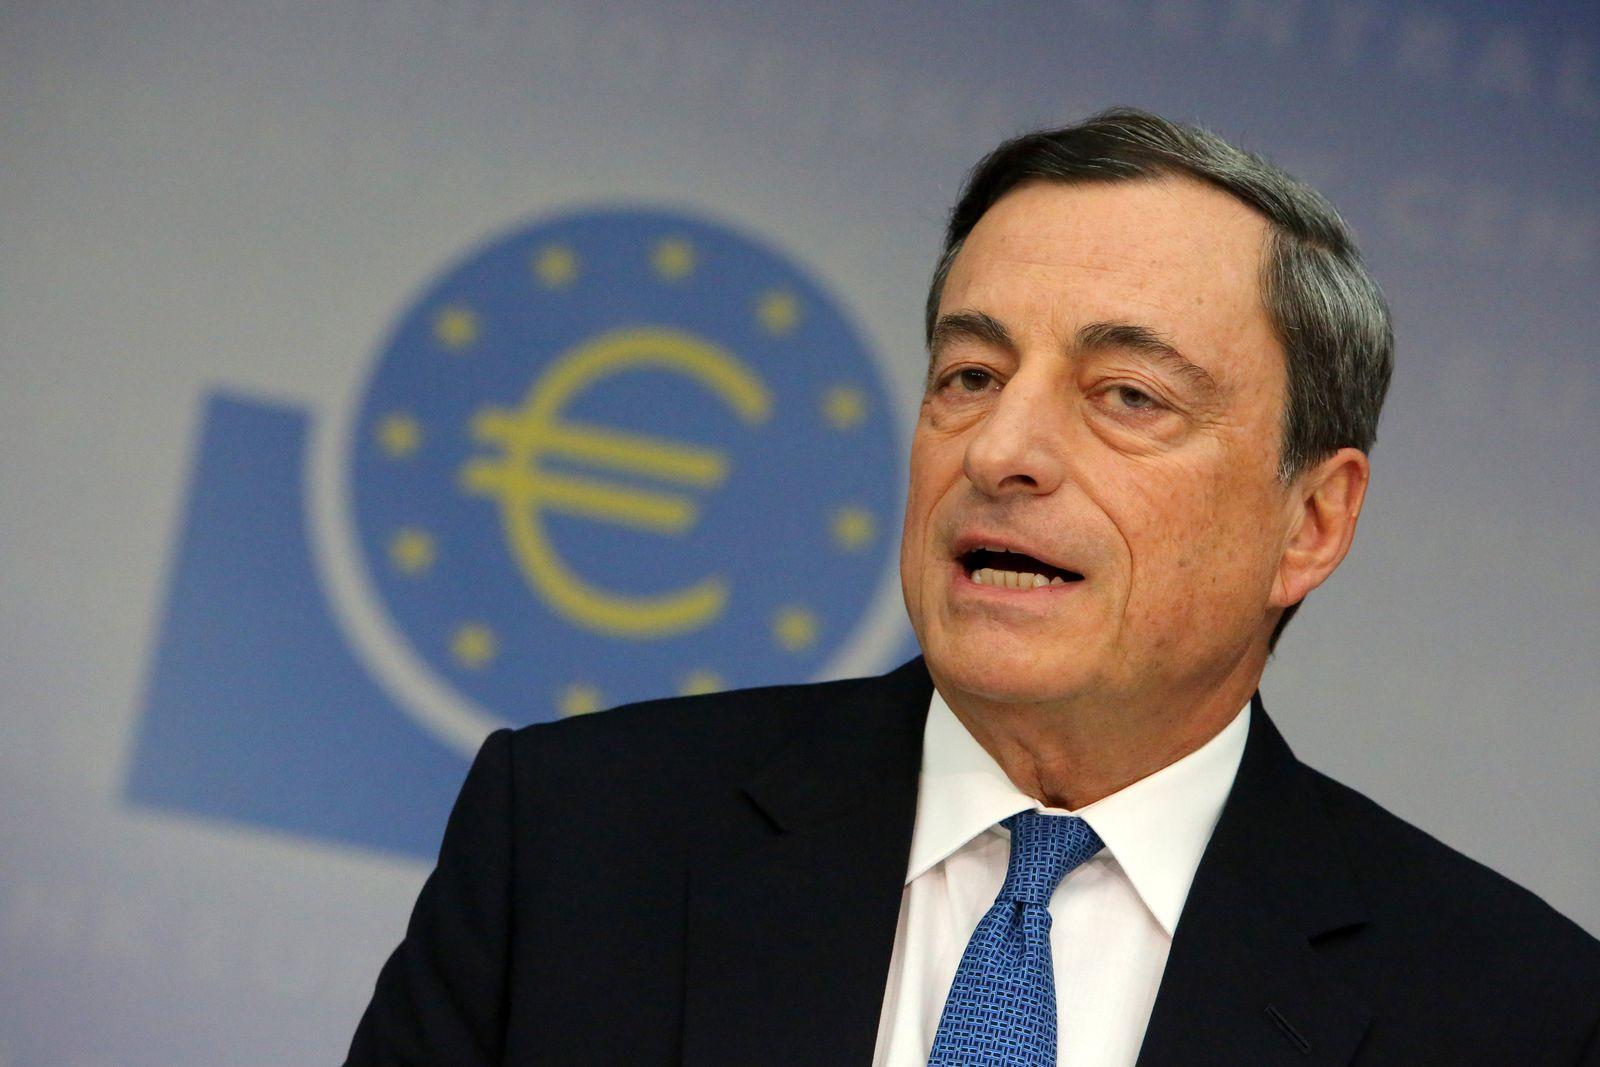 Jahresrückblick 2014 - Mario Draghi